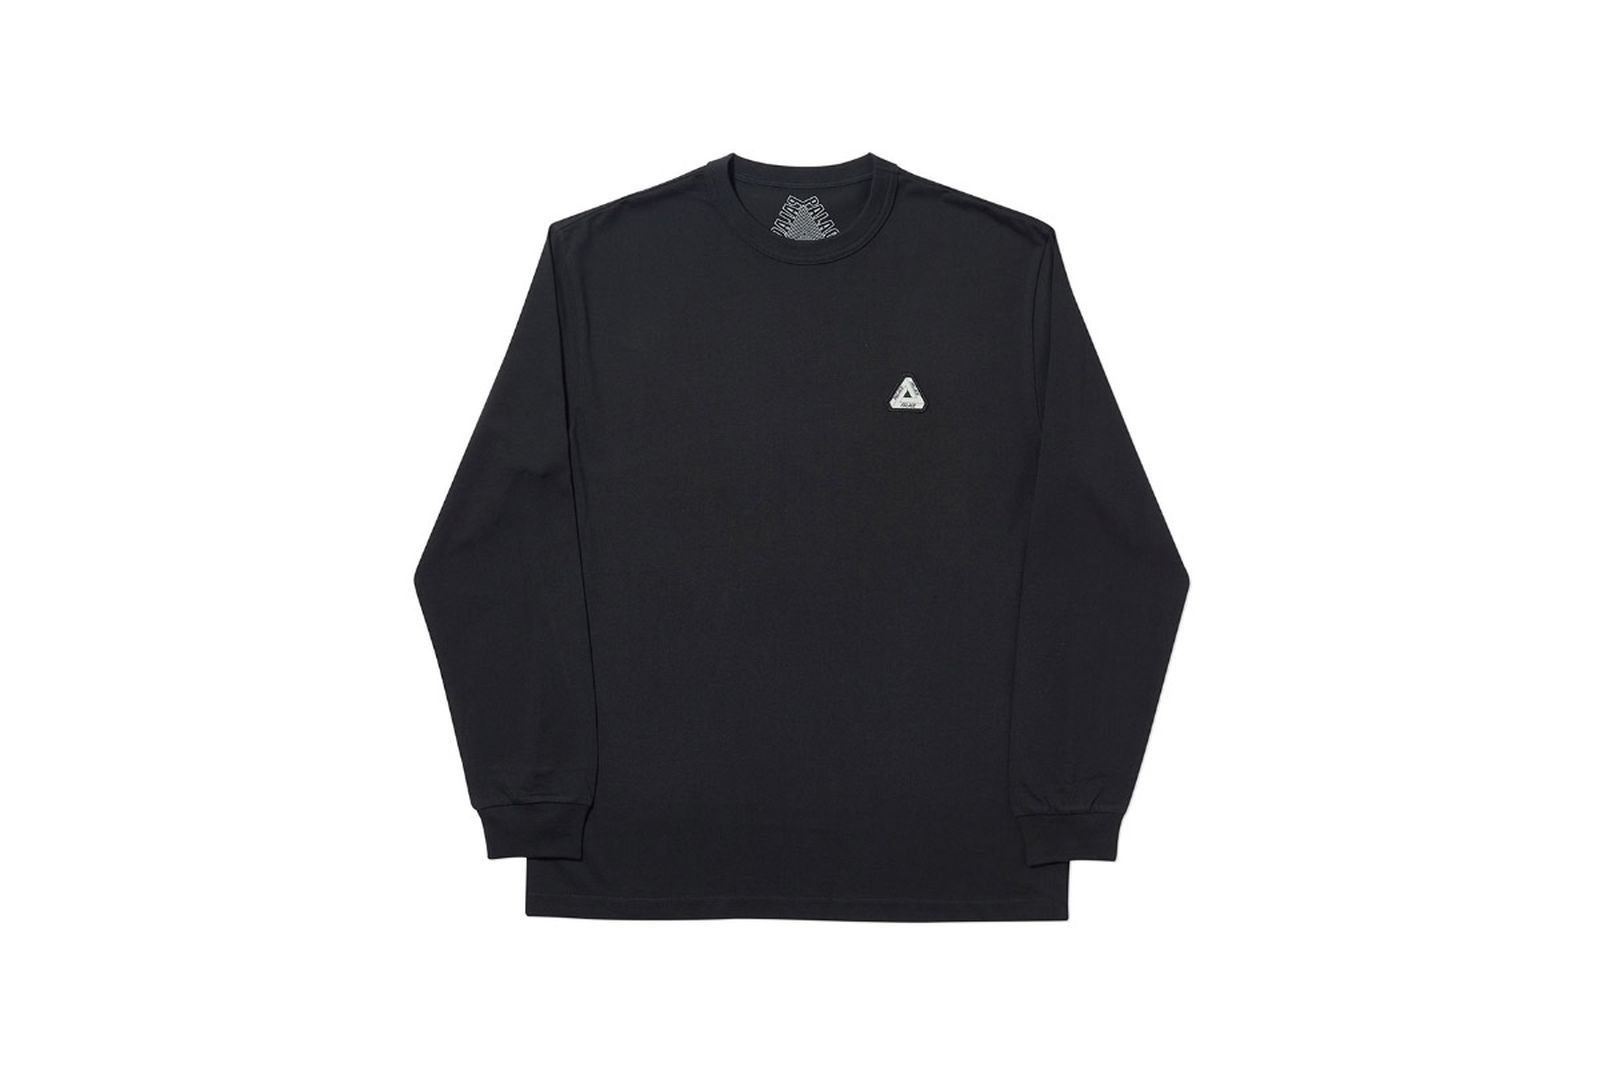 Palace 2019 Autumn Longsleeve T Shirt black